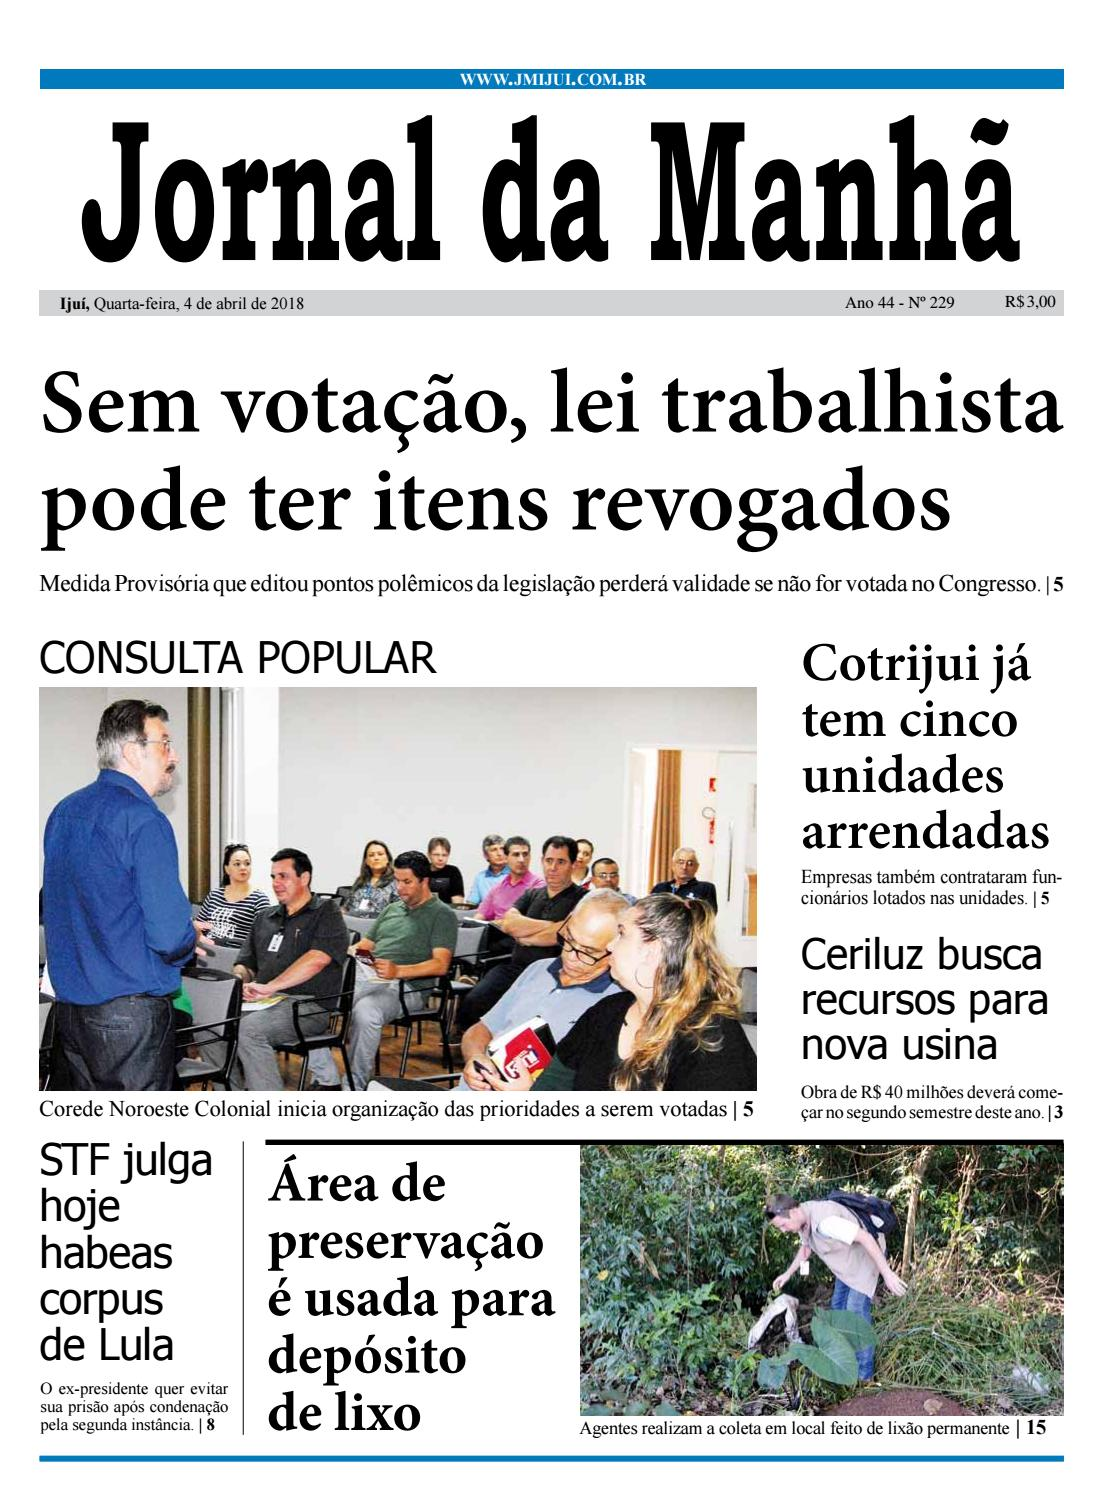 4b4932b68f Jornal da Manhã - Quarta-feira - 04-04-2018 by clicjm - issuu